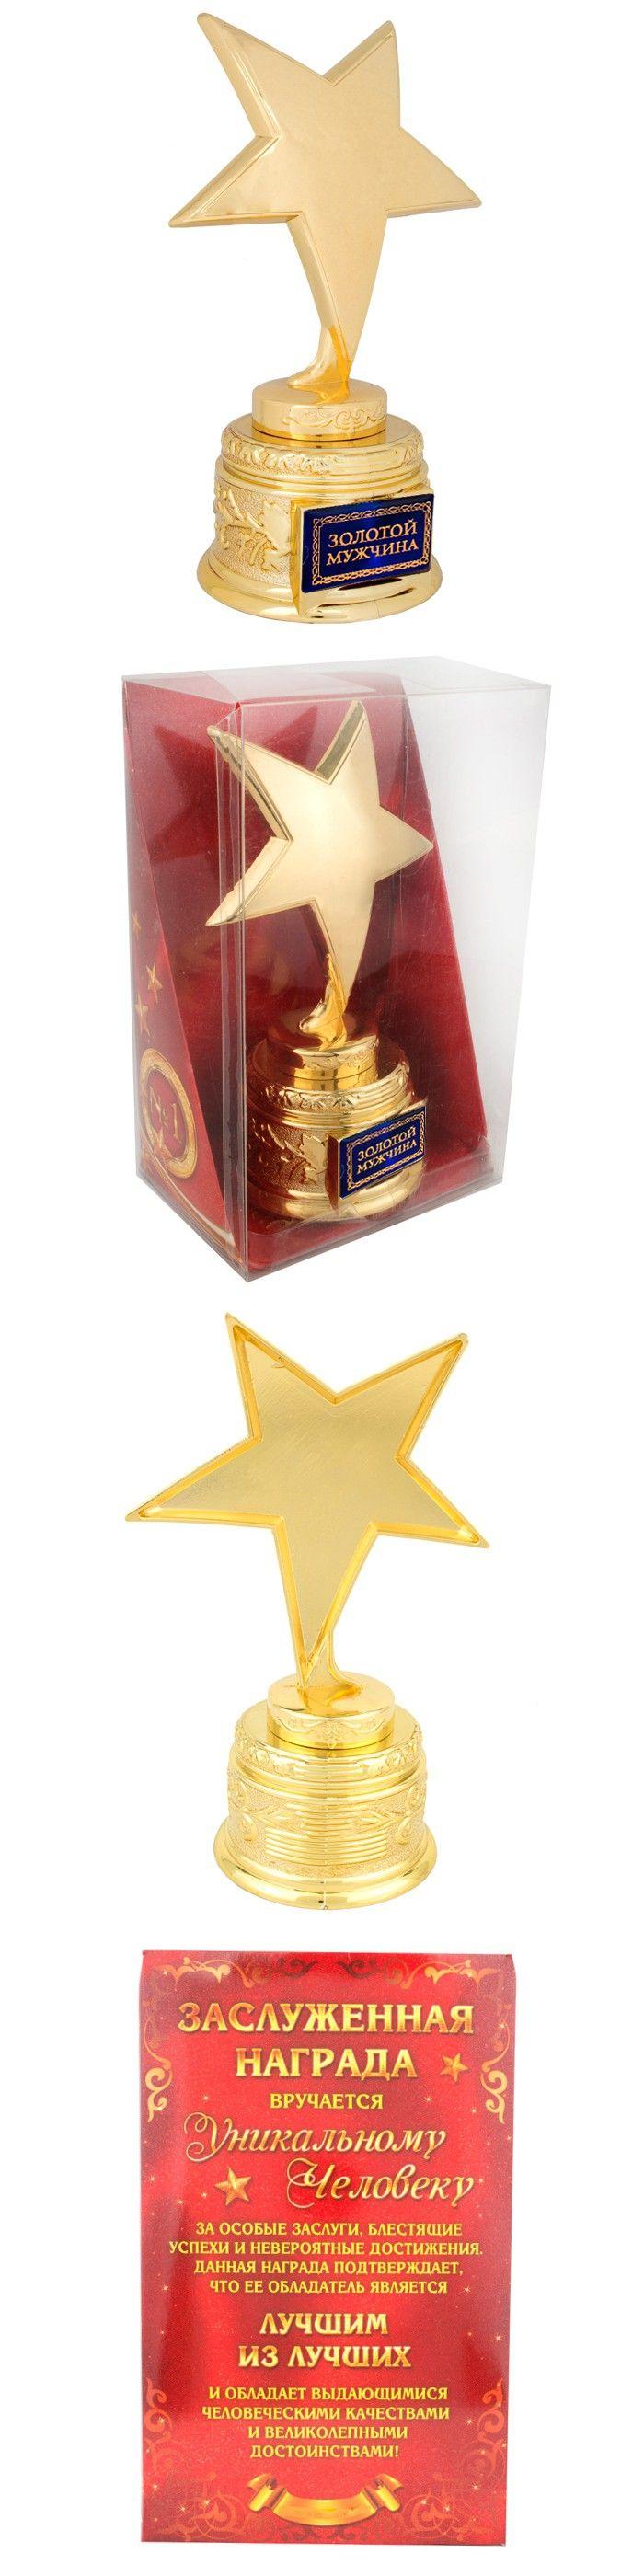 Retro star trophy,home decoration. vintage trophy. gift box craft. medal for male star. Star Medal art for women/men $15.58